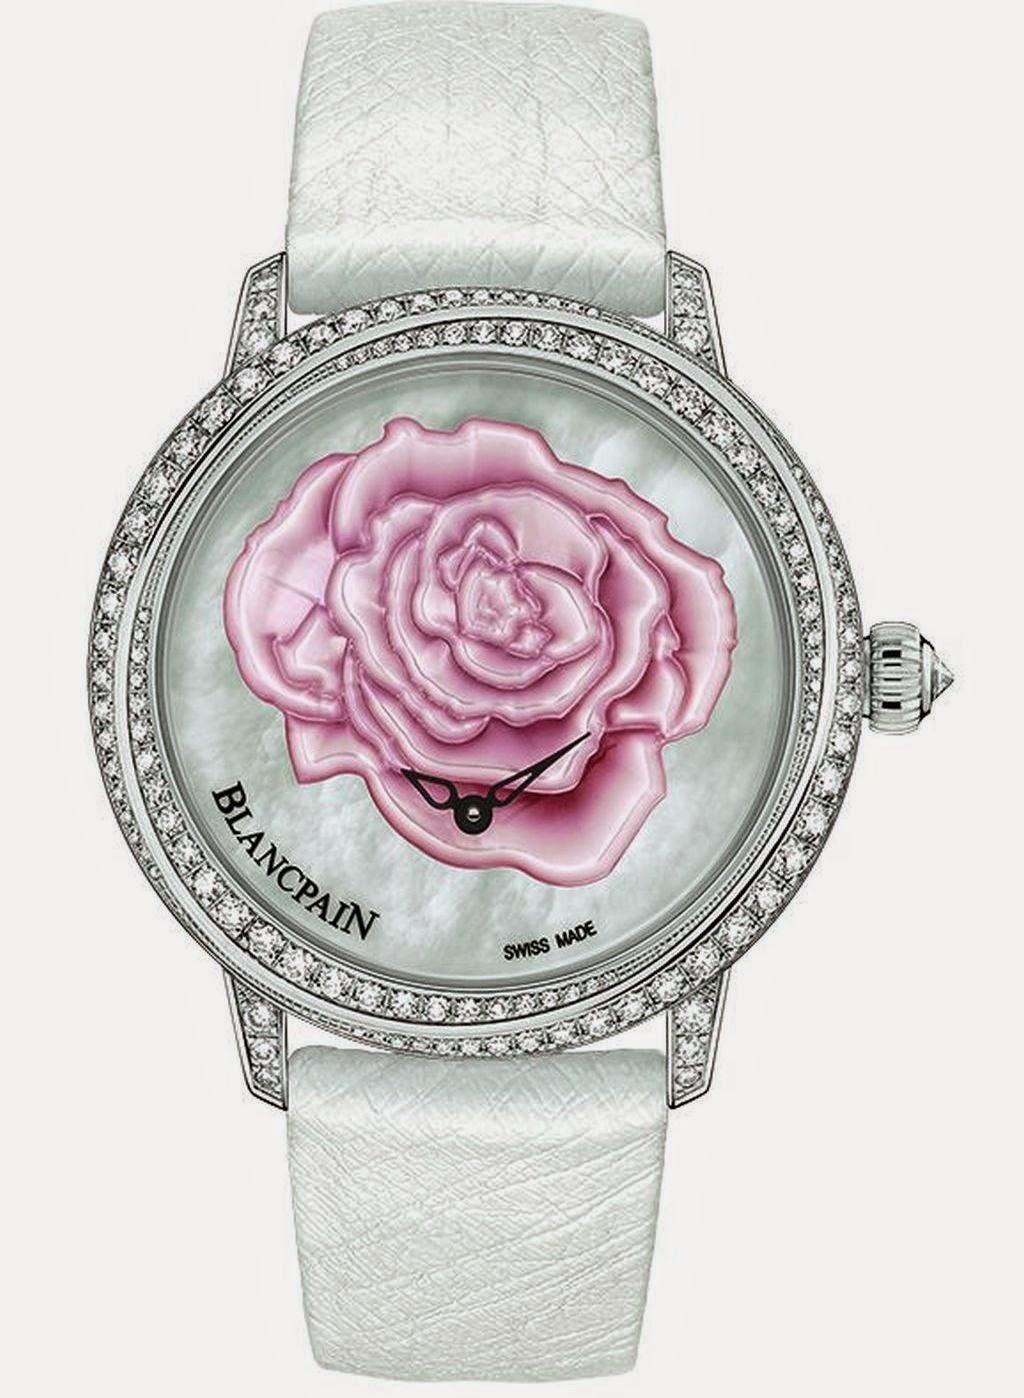 Blancpain Saint Valentine's Day 2015 replica watch